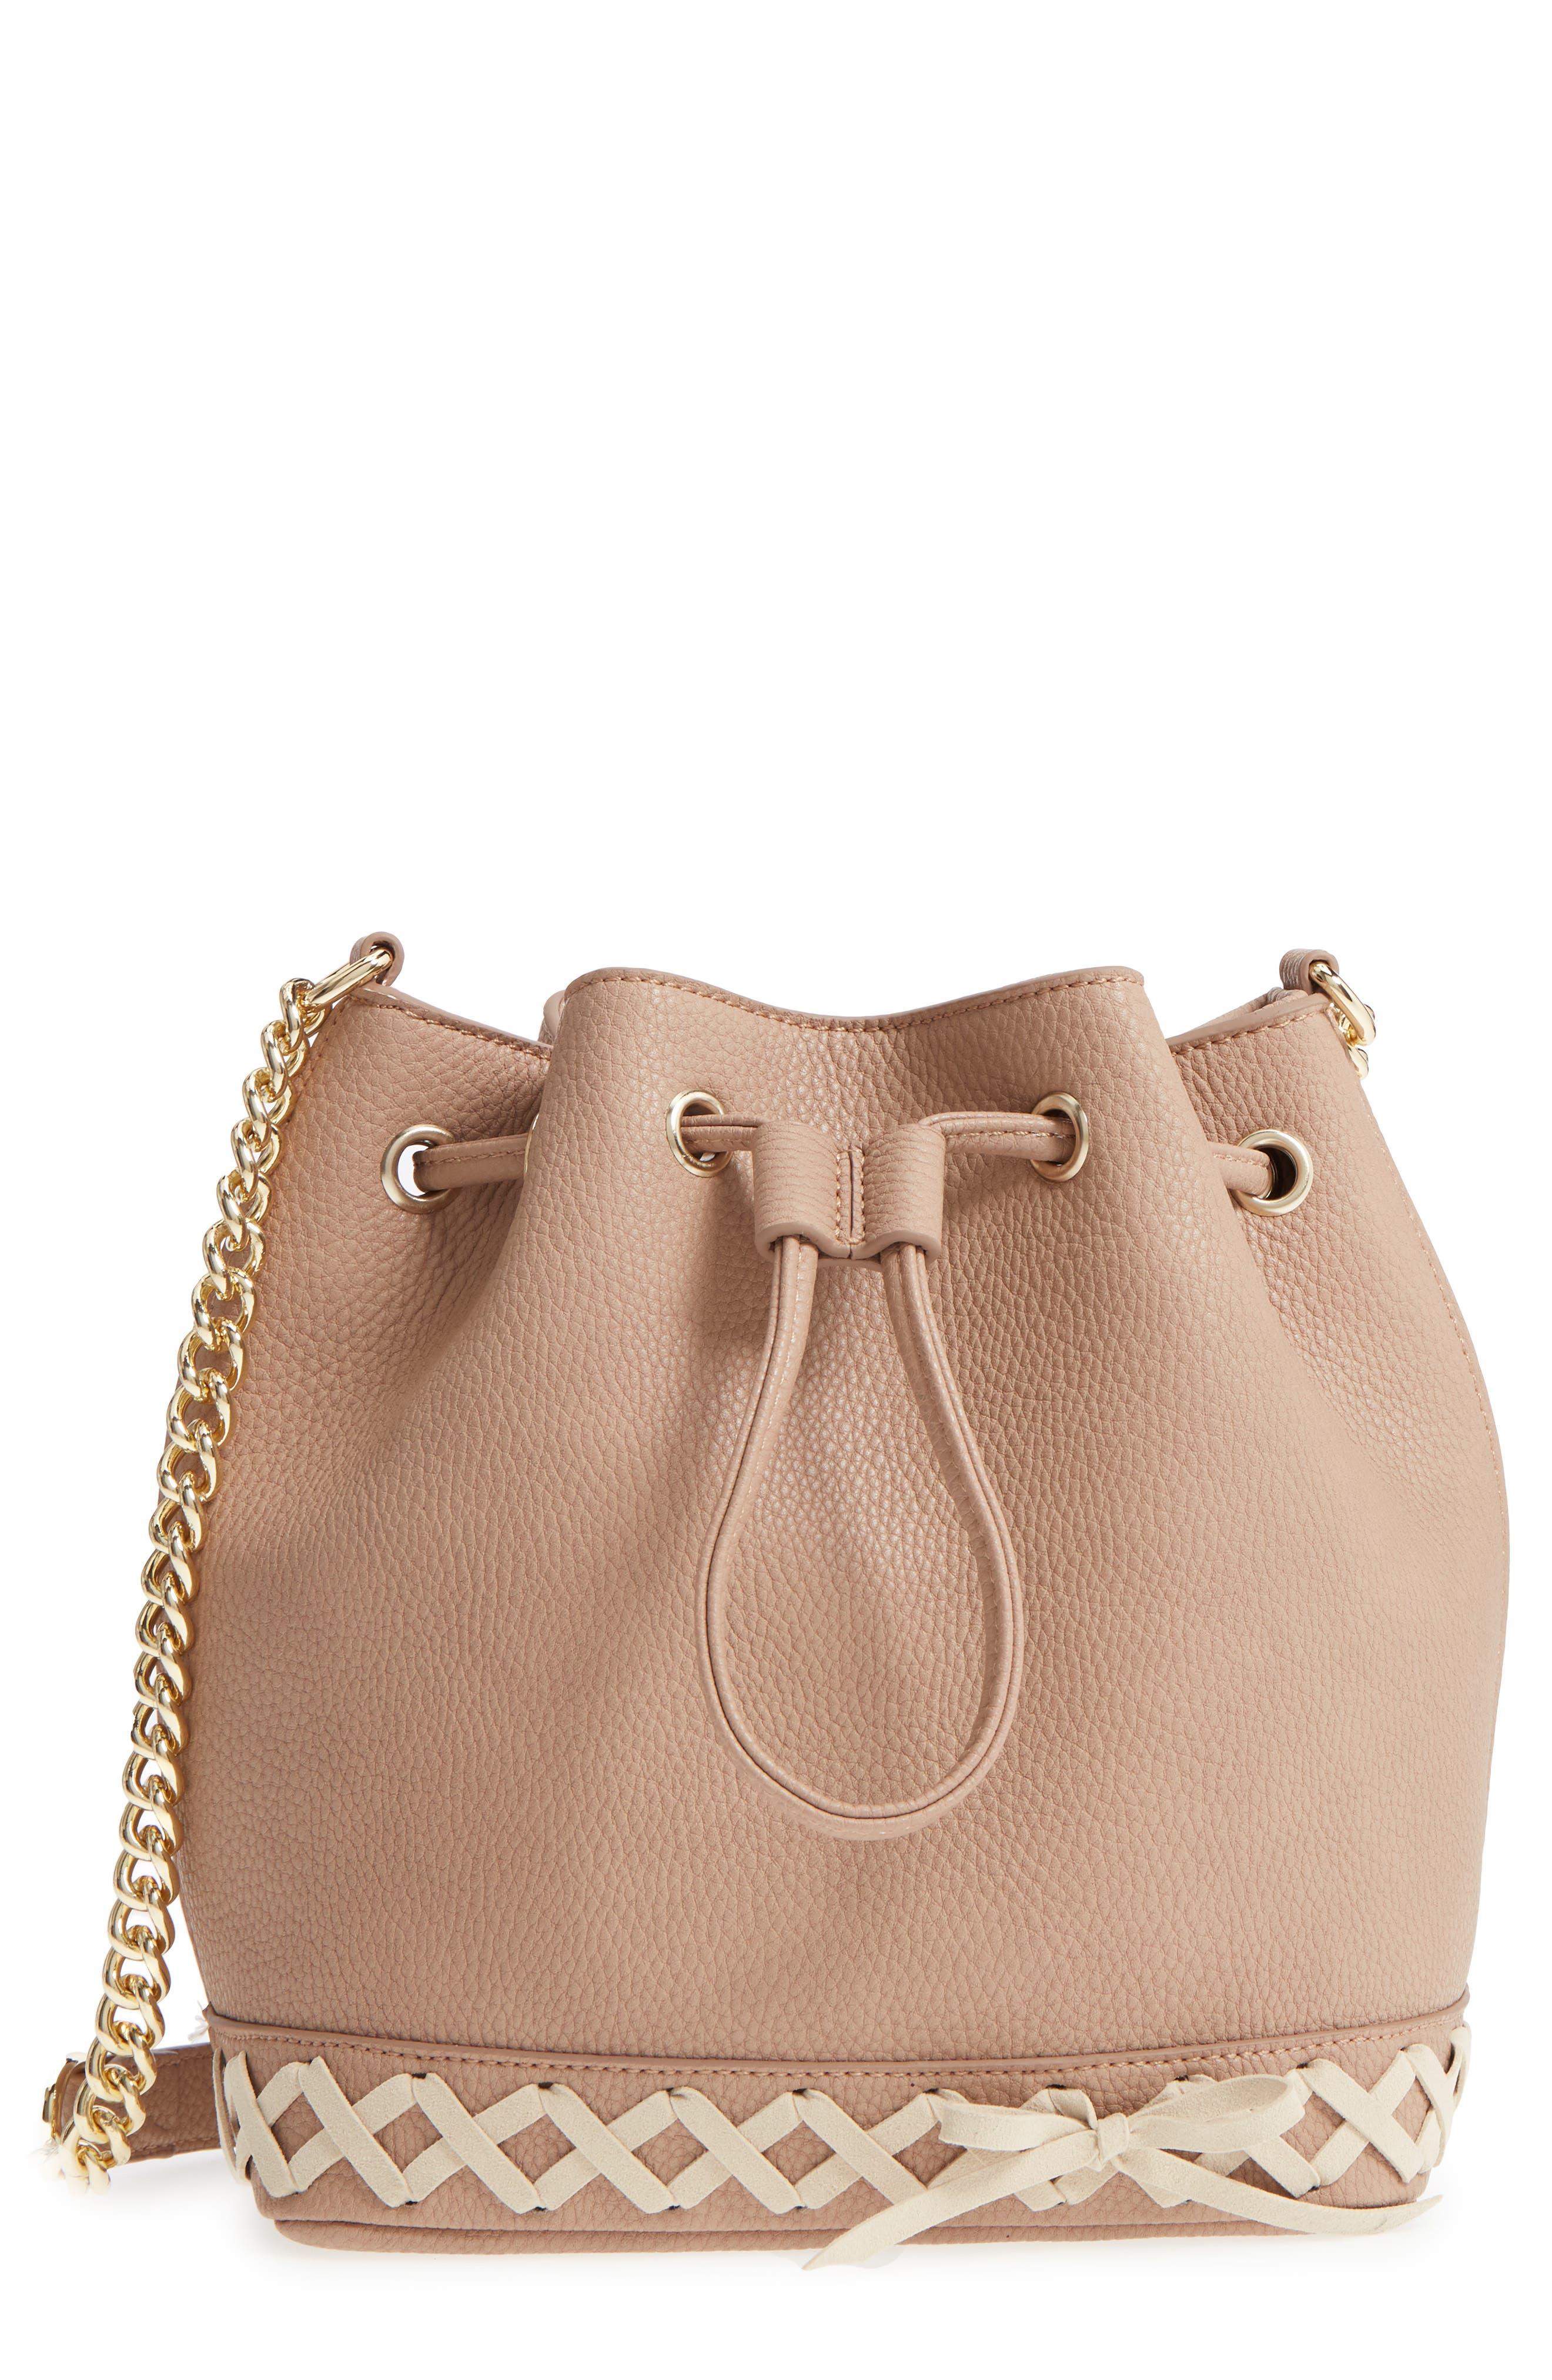 Veronica Faux Leather Bucket Bag,                             Main thumbnail 1, color,                             250